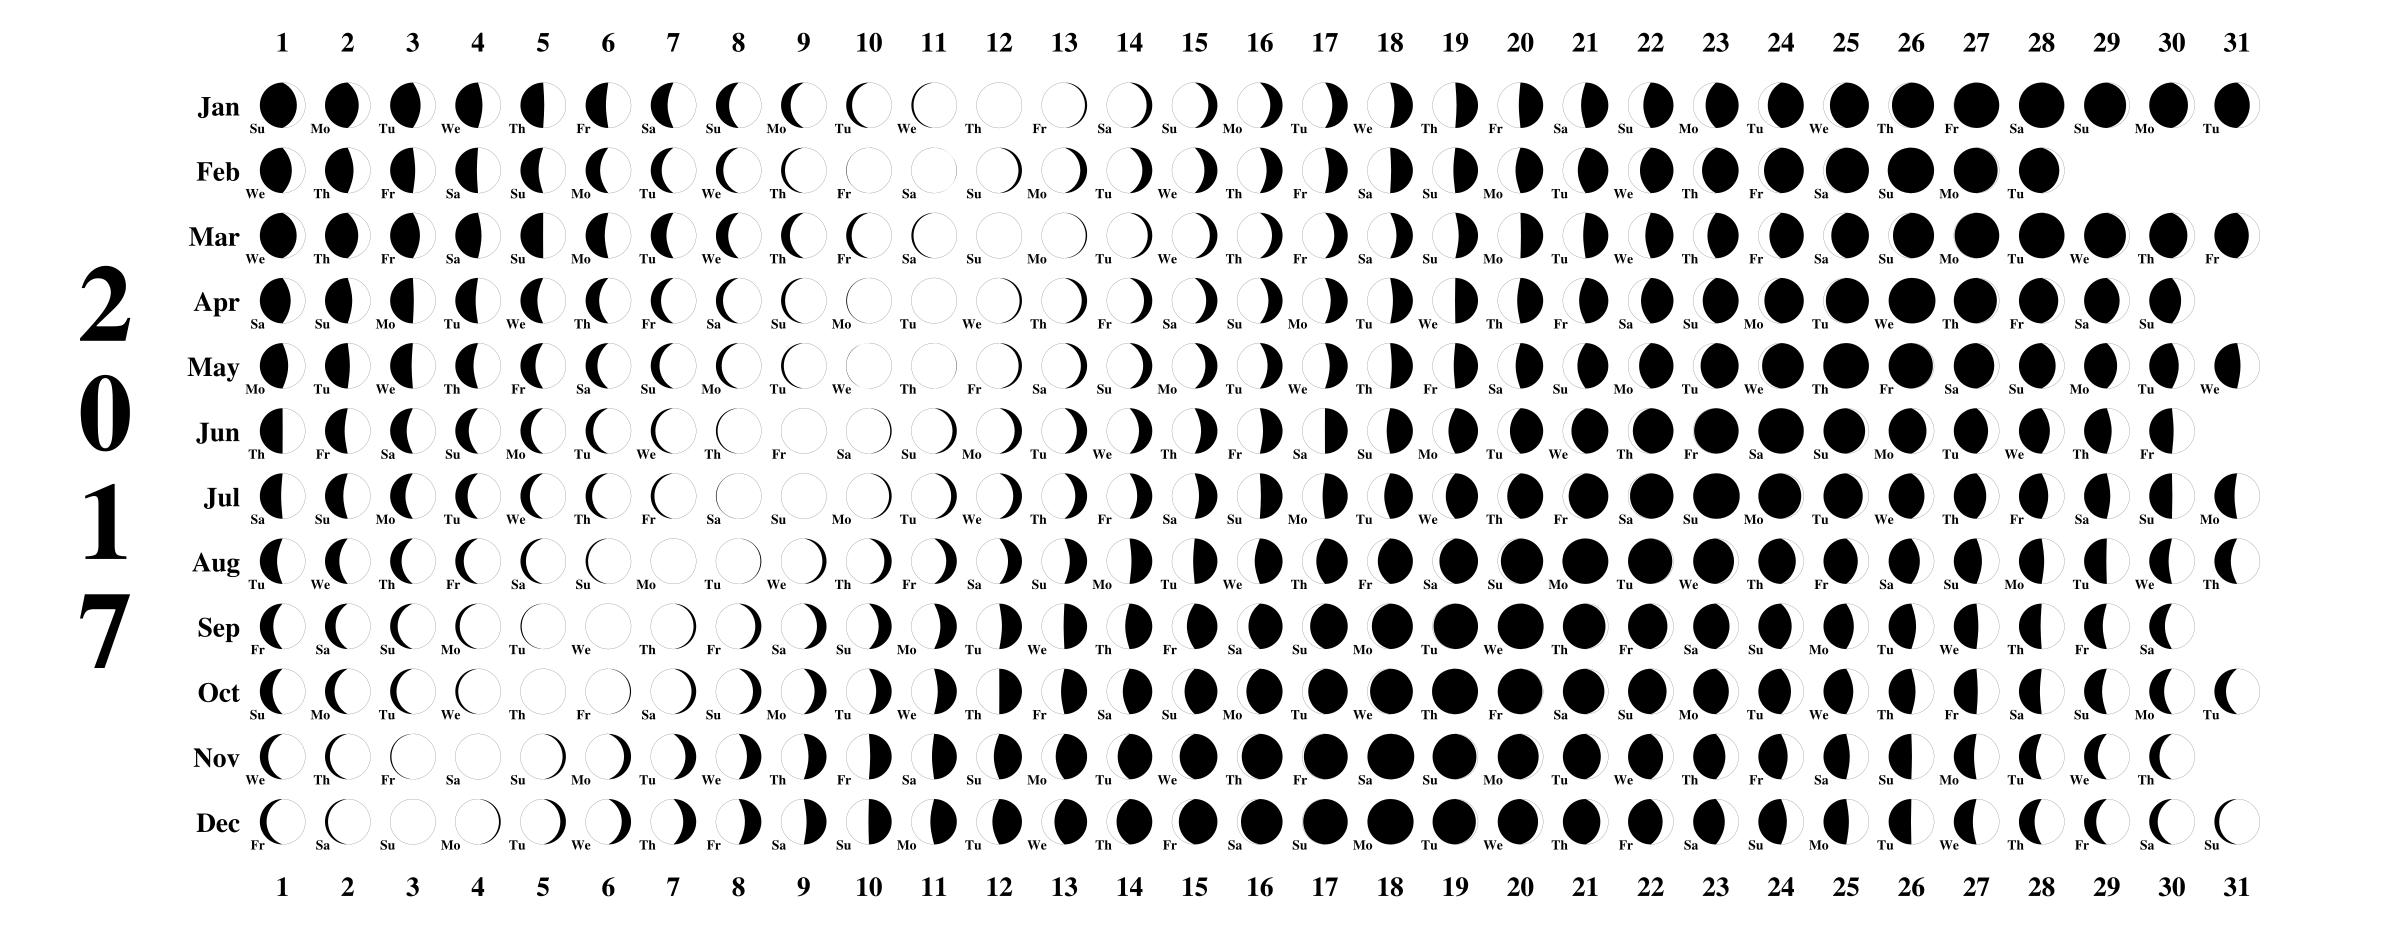 Earth, Moon, And Sun 1.1 Lessons Tes Teach